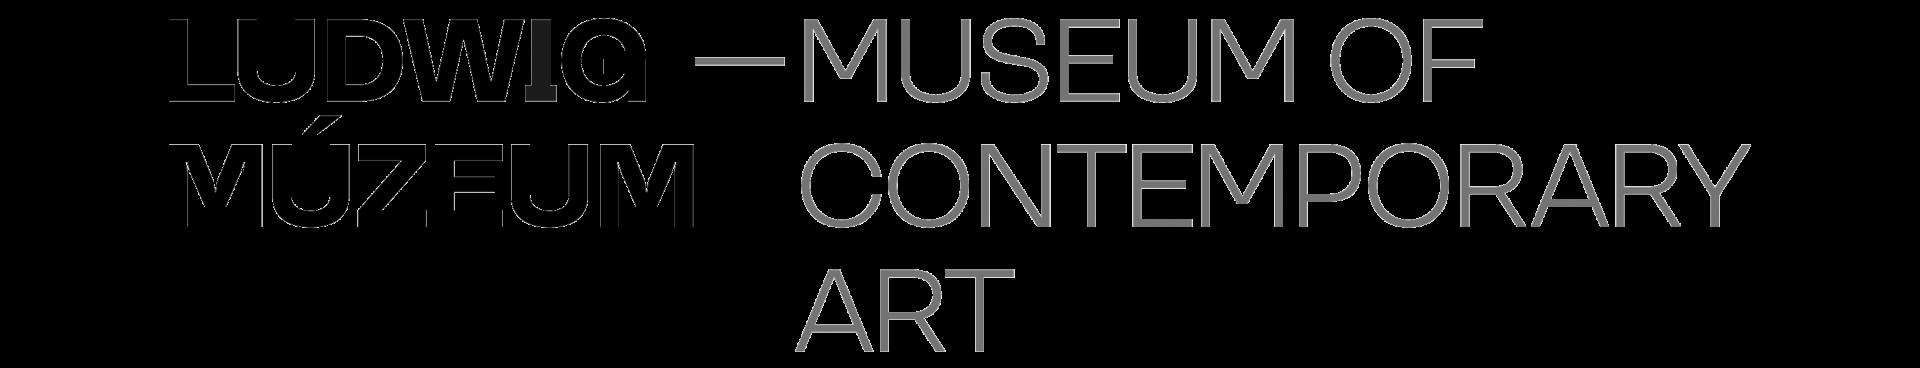 Ludwig Museum – Museum of Contemporary Art logo